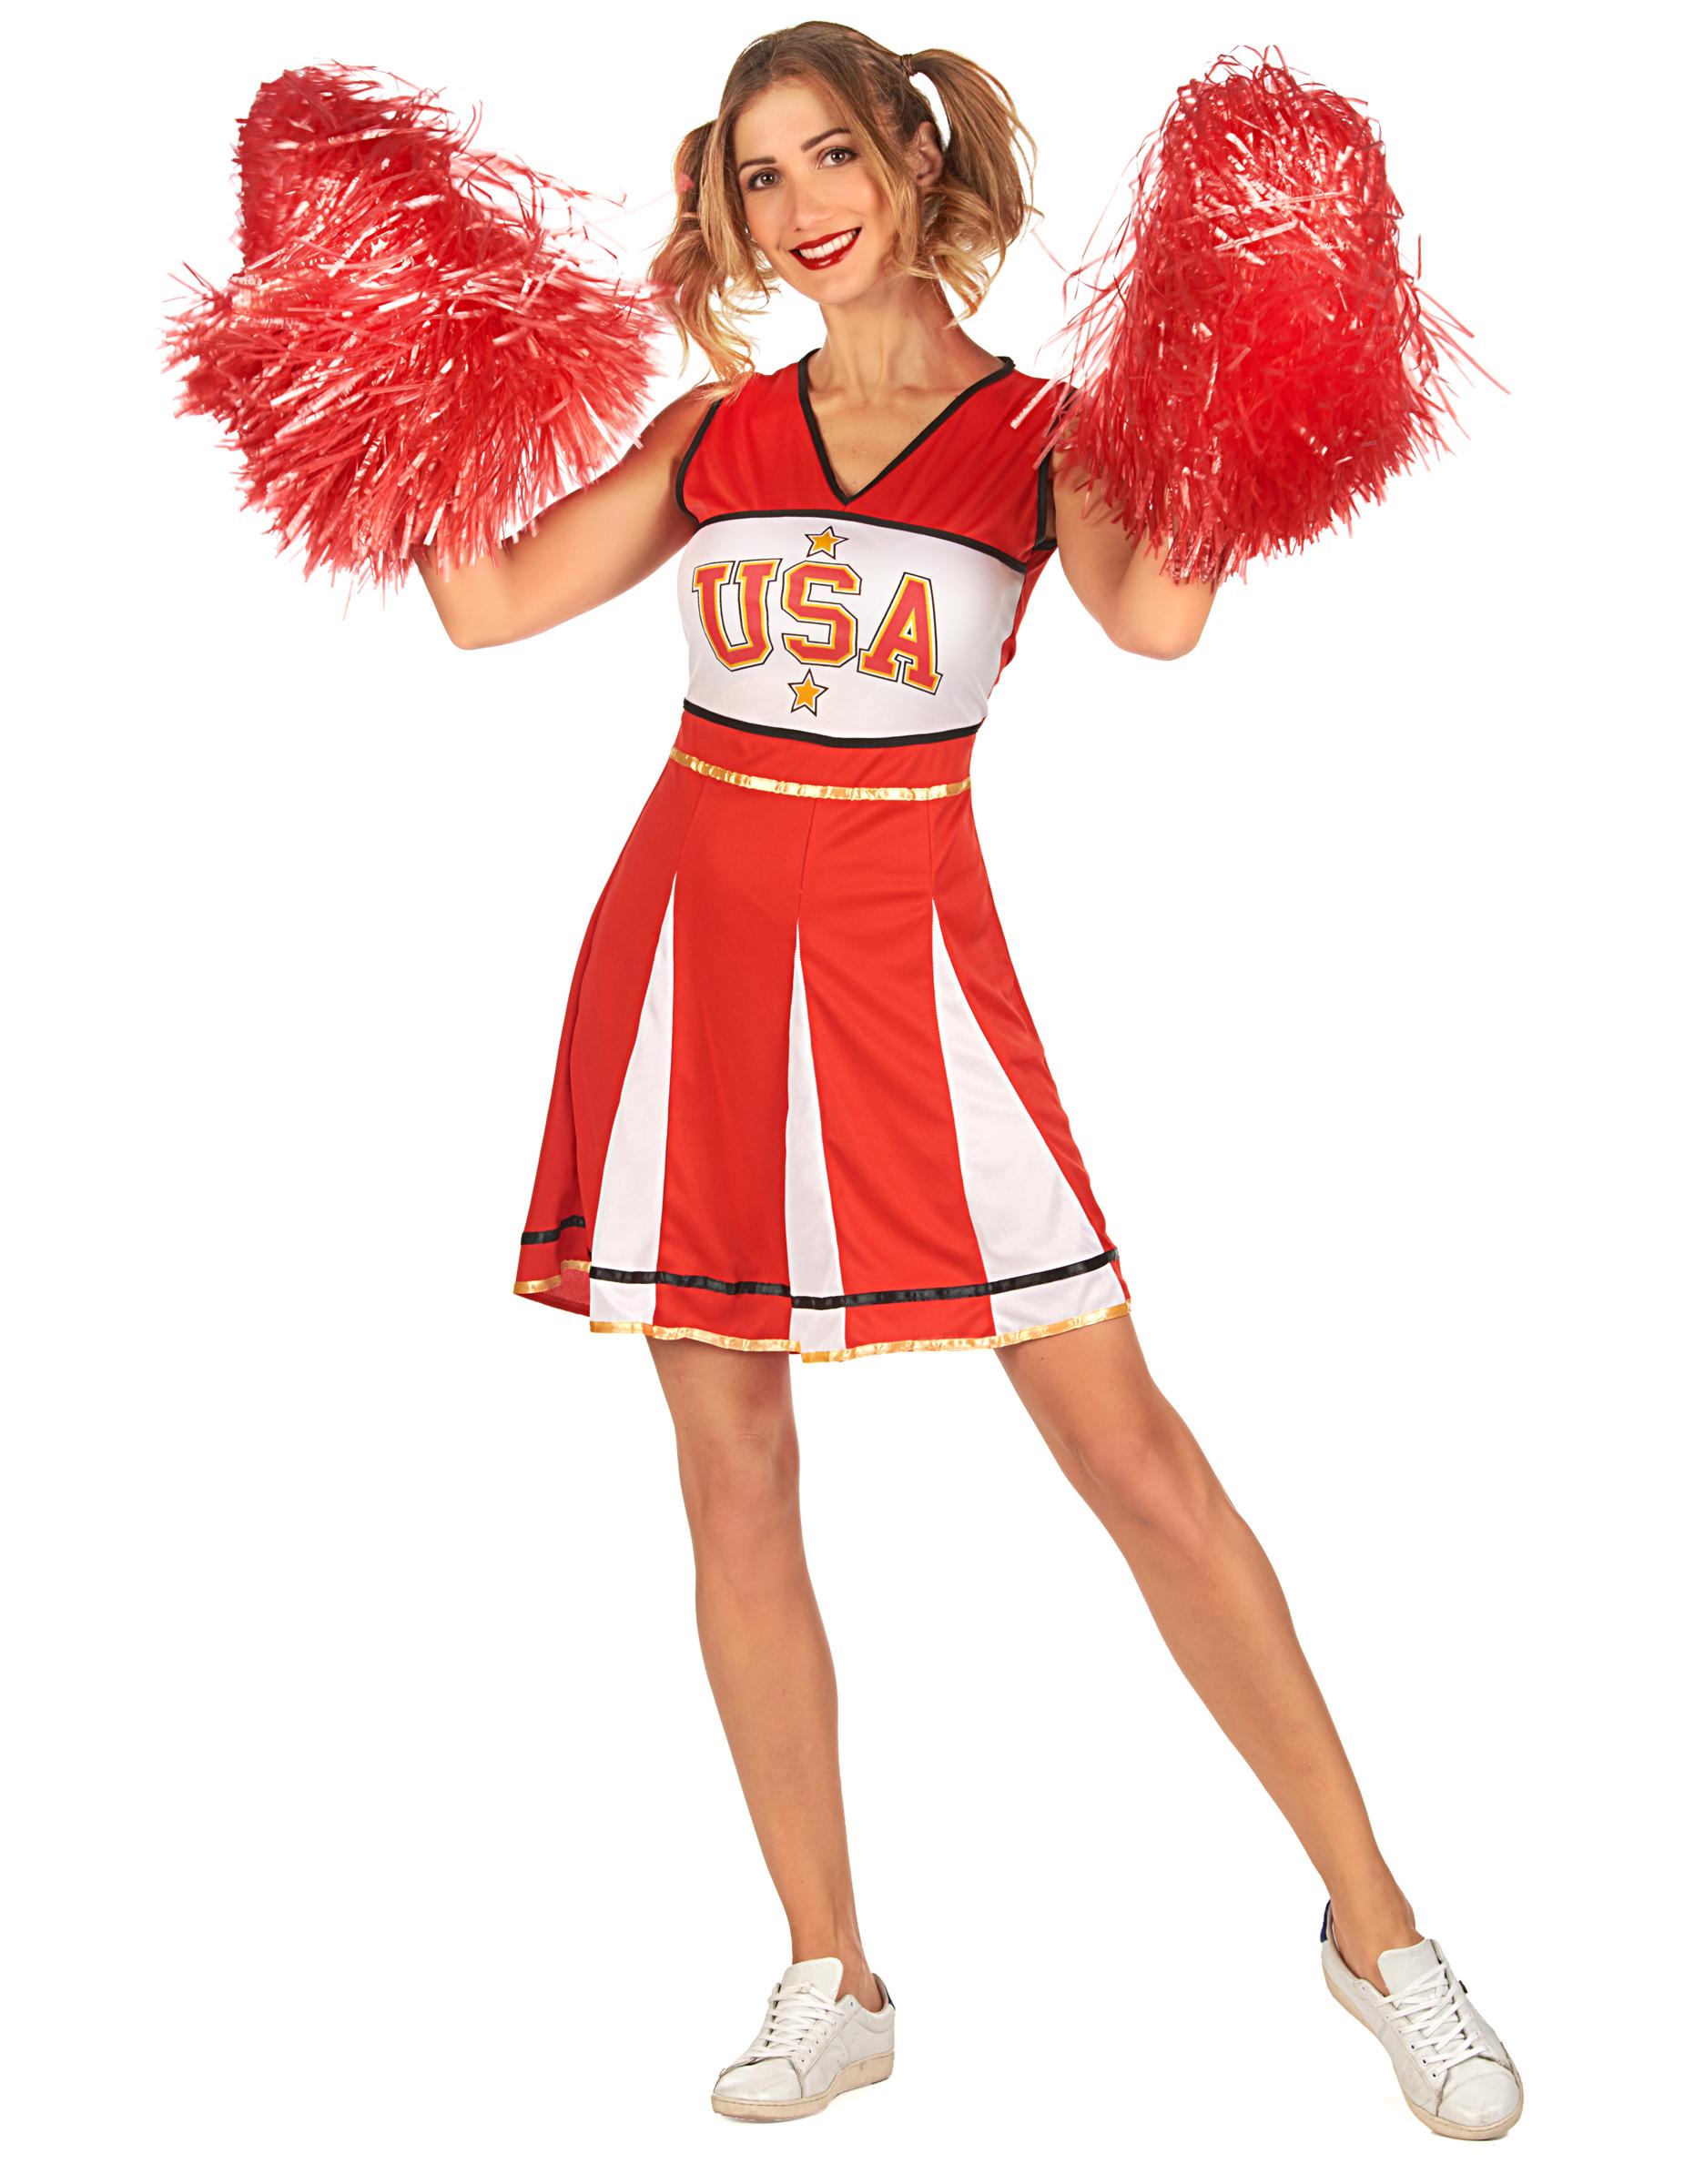 Déguisement pompom girl USA rouge femme